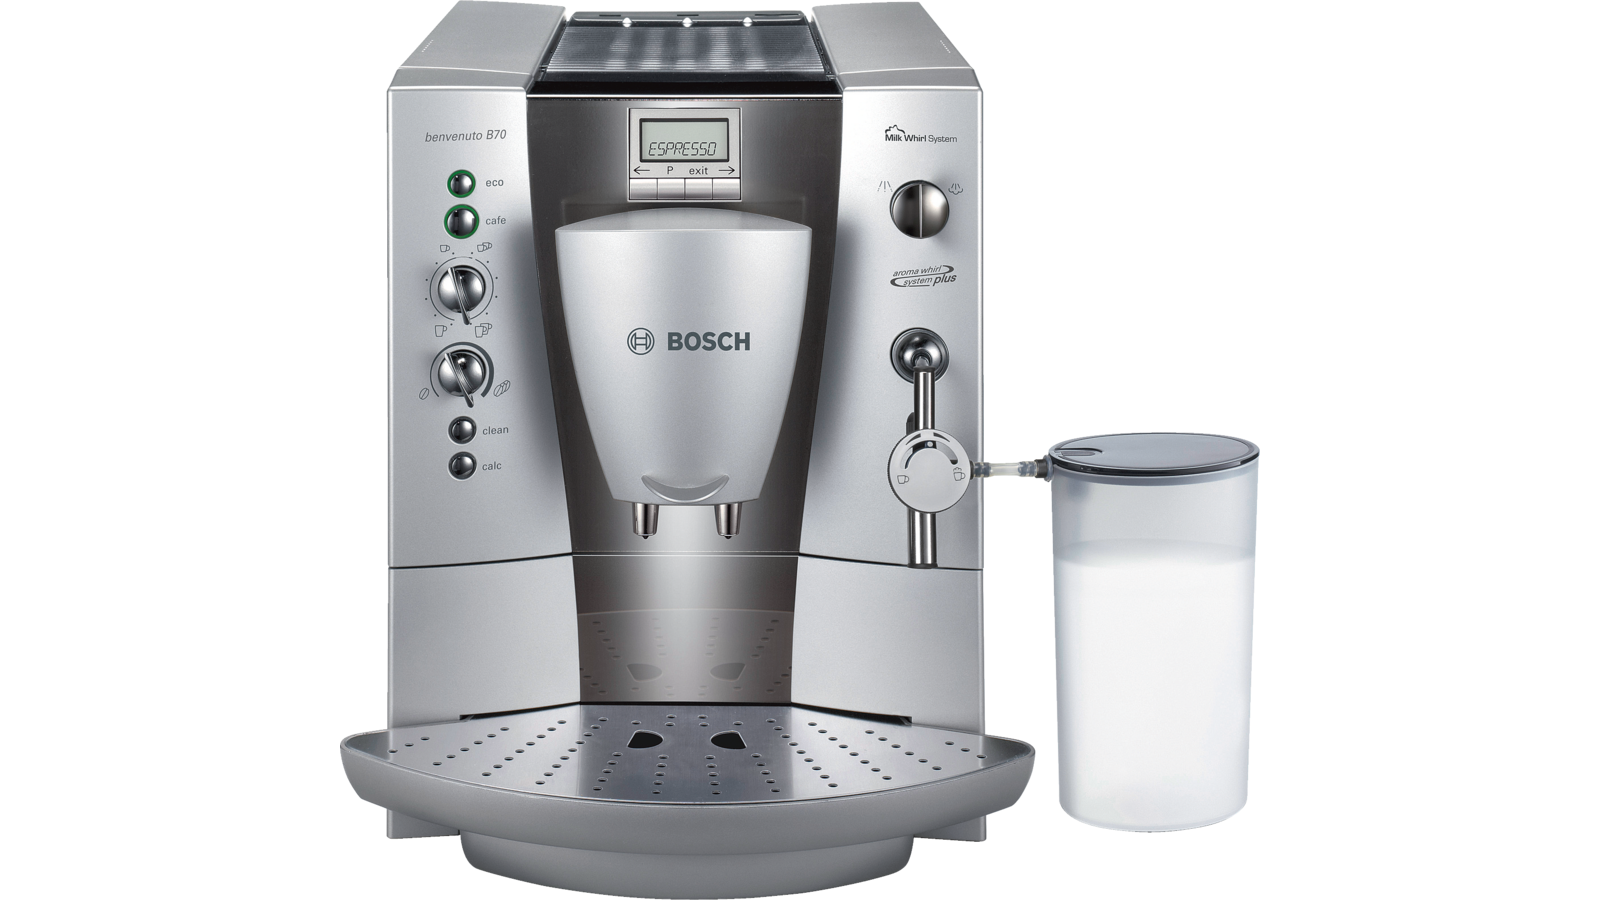 BOSCH TCA6801 Cafetera automática benvenuto B70